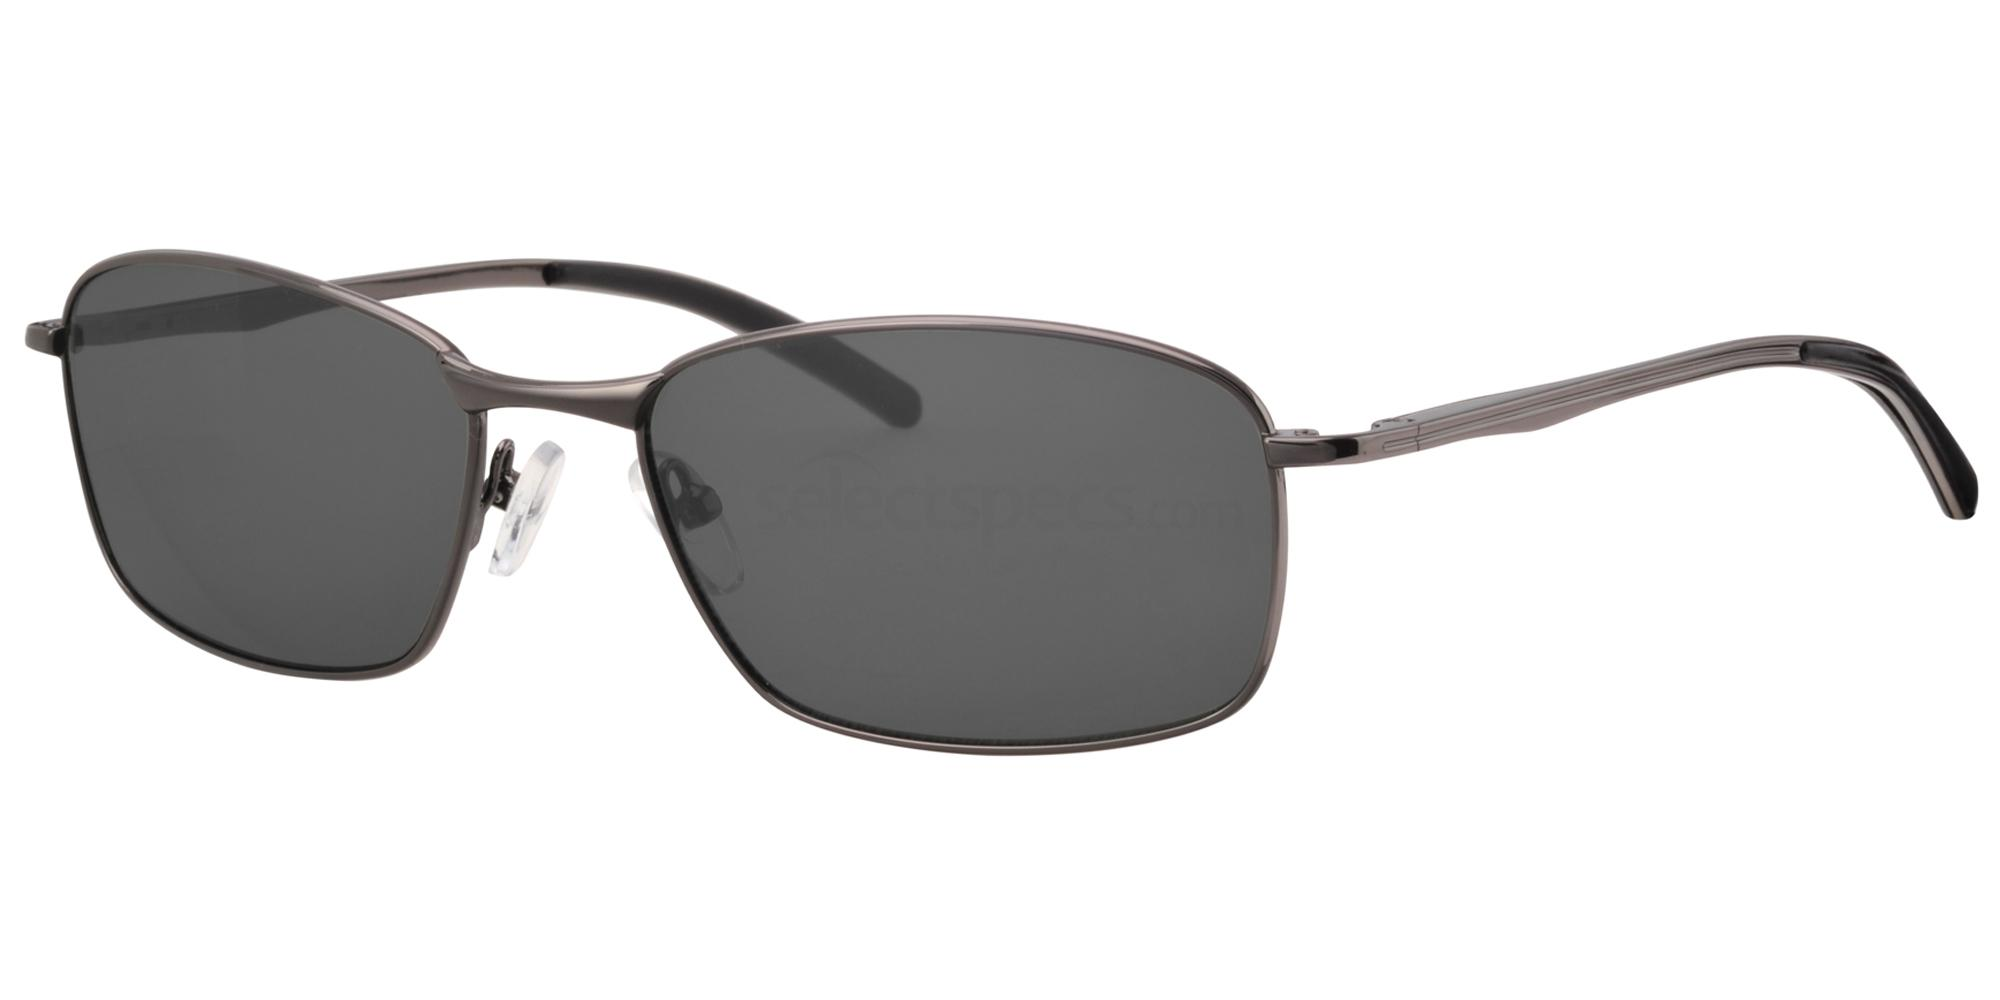 C01 VS185 Sunglasses, Visage